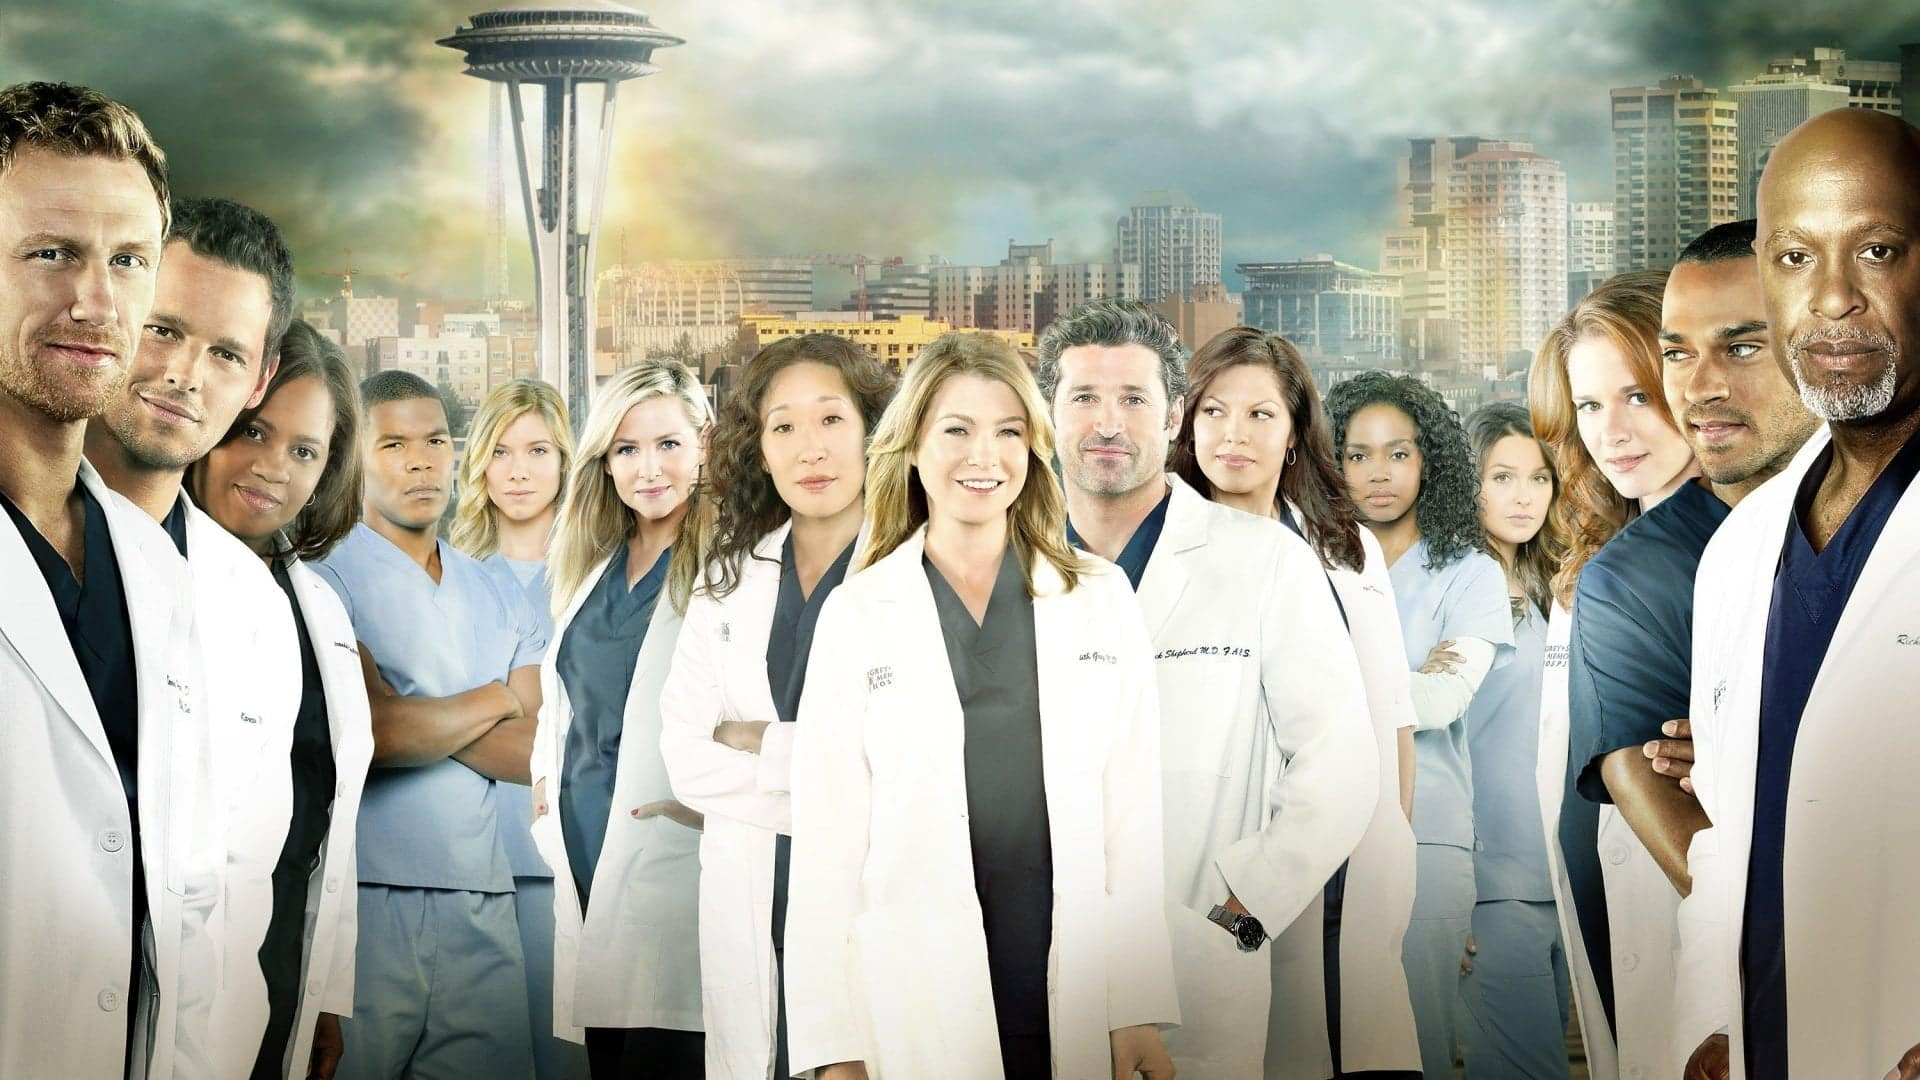 Greys Anatomy divulgacao 2